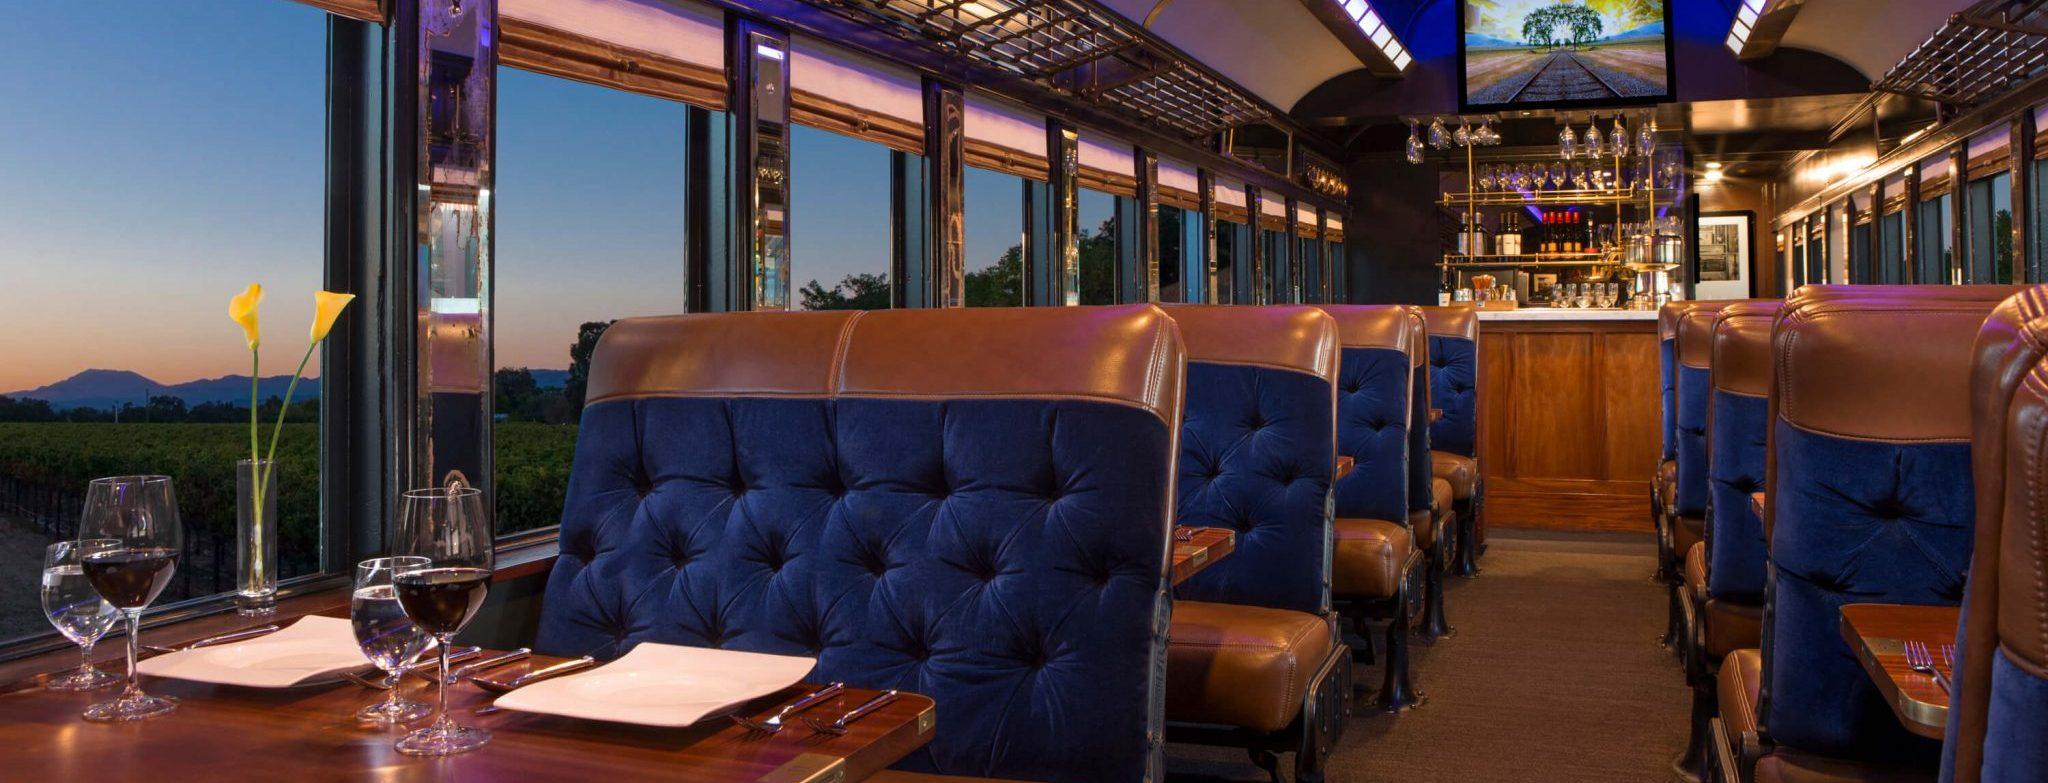 Napa Wine Train – Full Day Winery Tours